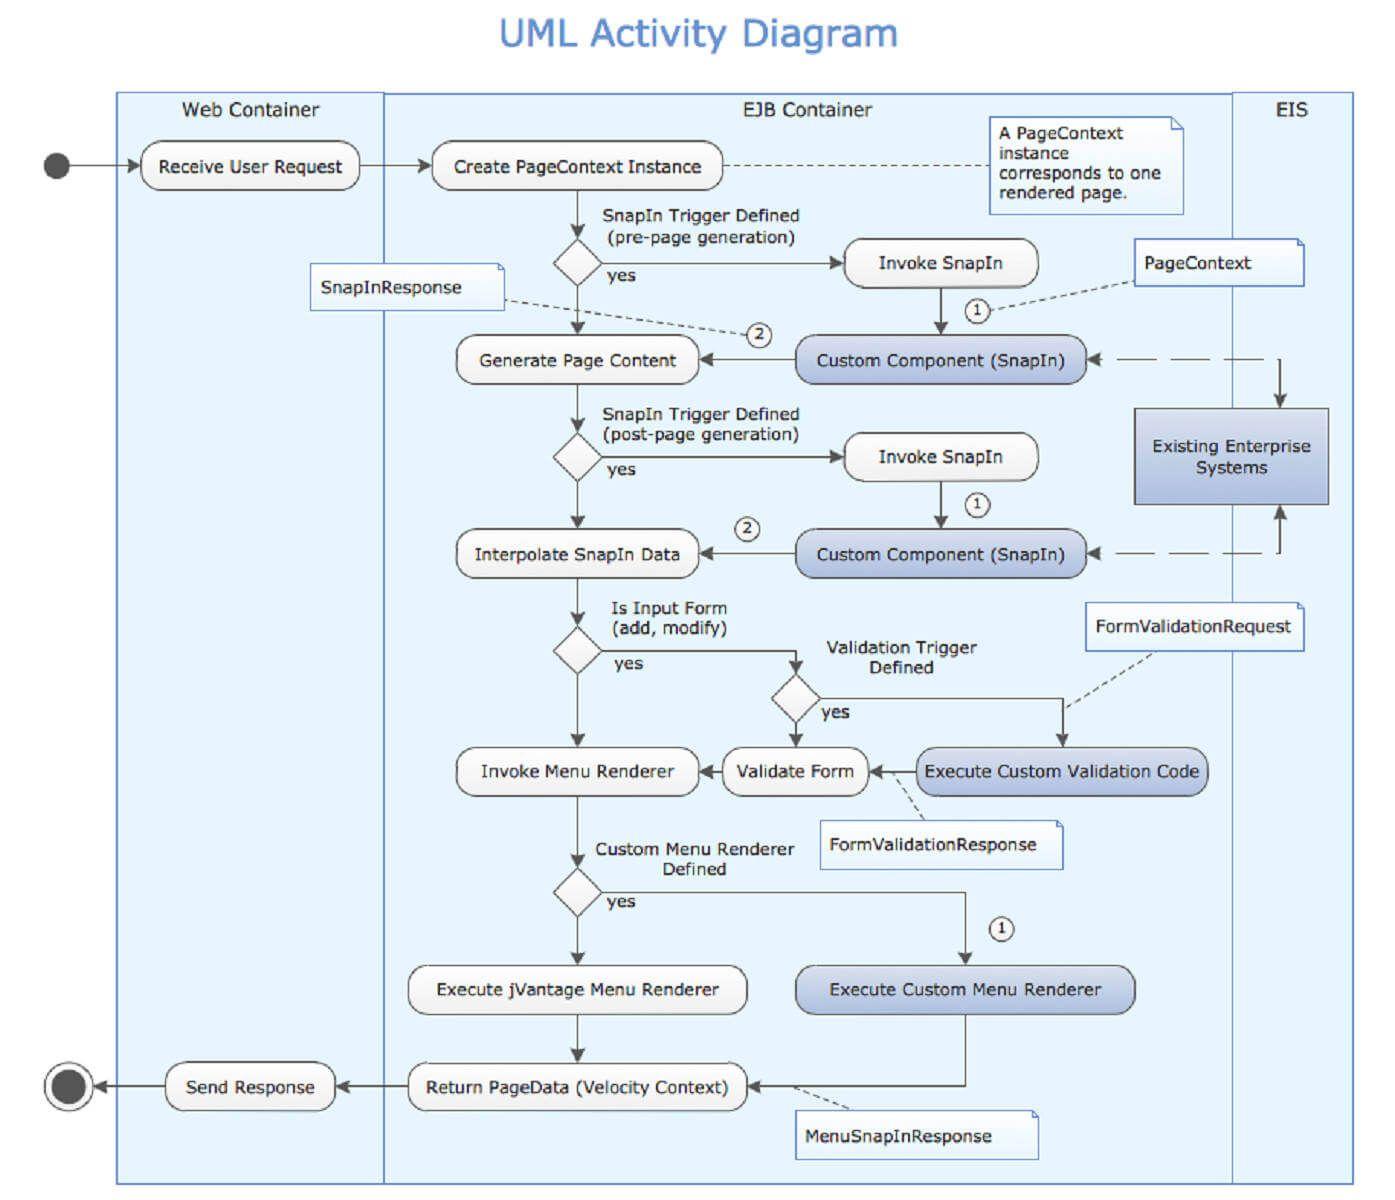 45 Clever Uml Diagram Software Free Ideas | Activity diagram